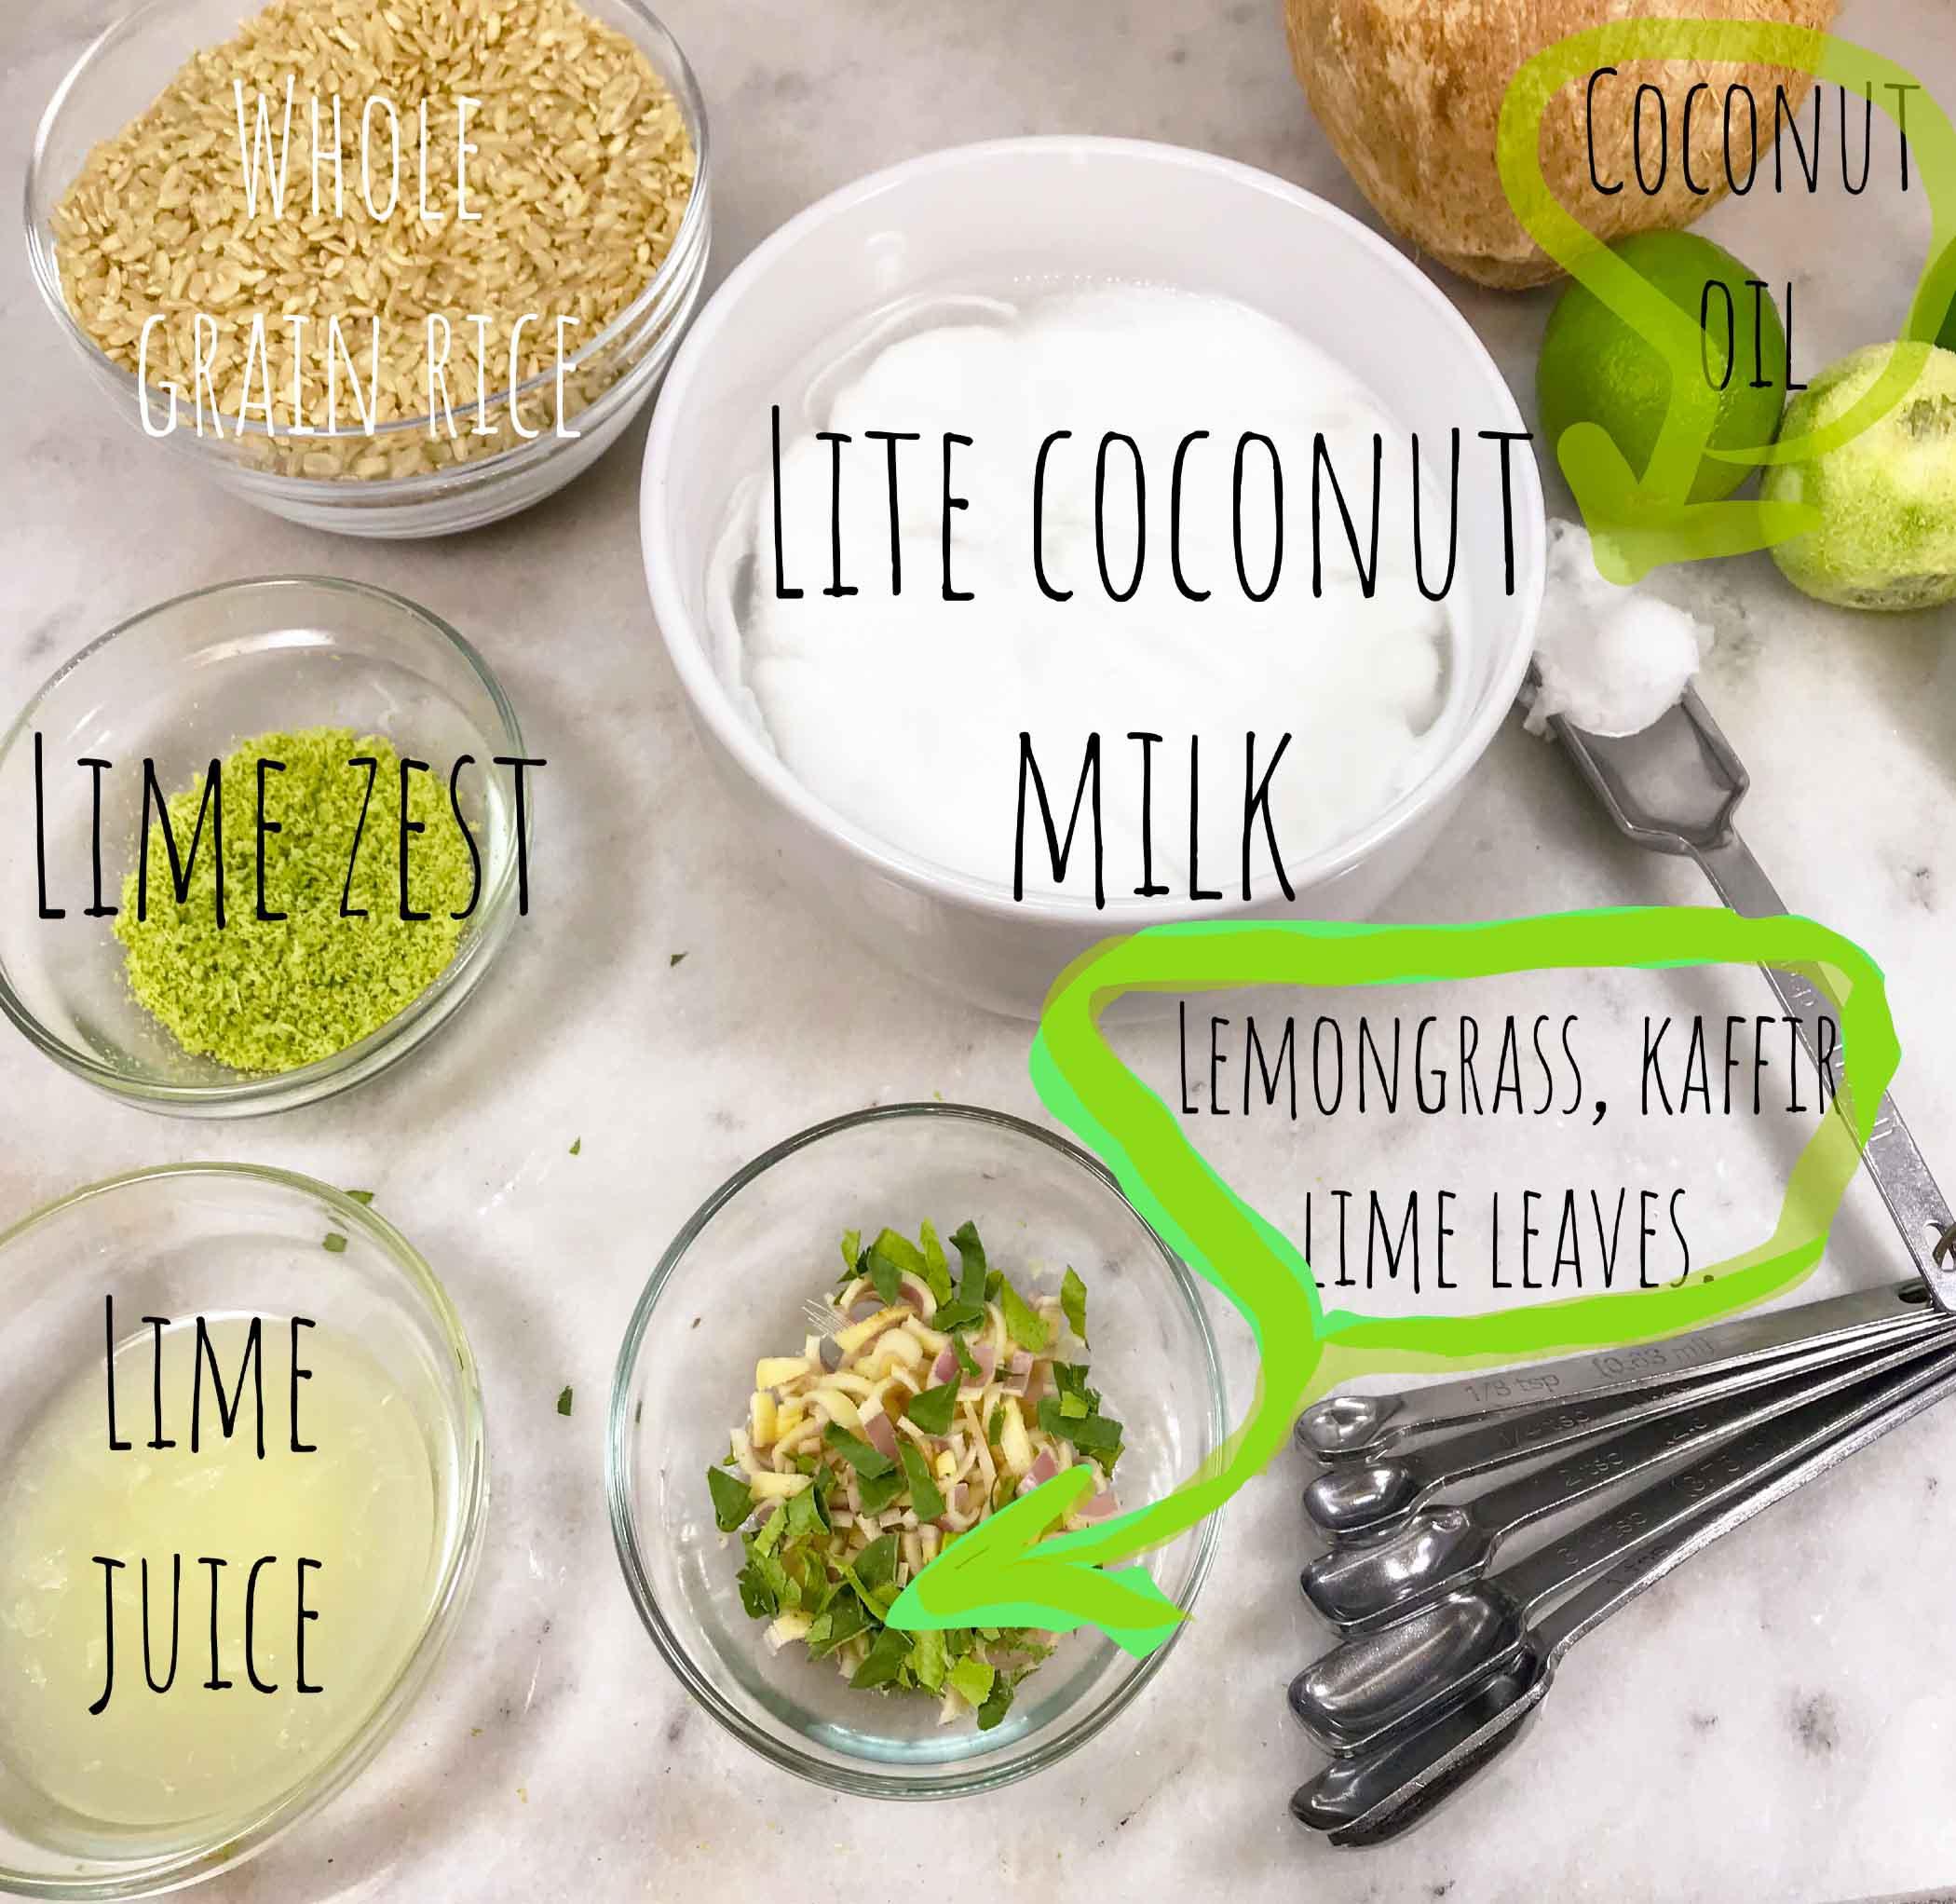 Instant Pot Thai Whole Grain Coconut, Lemongrass and Lime Rice Ingredients